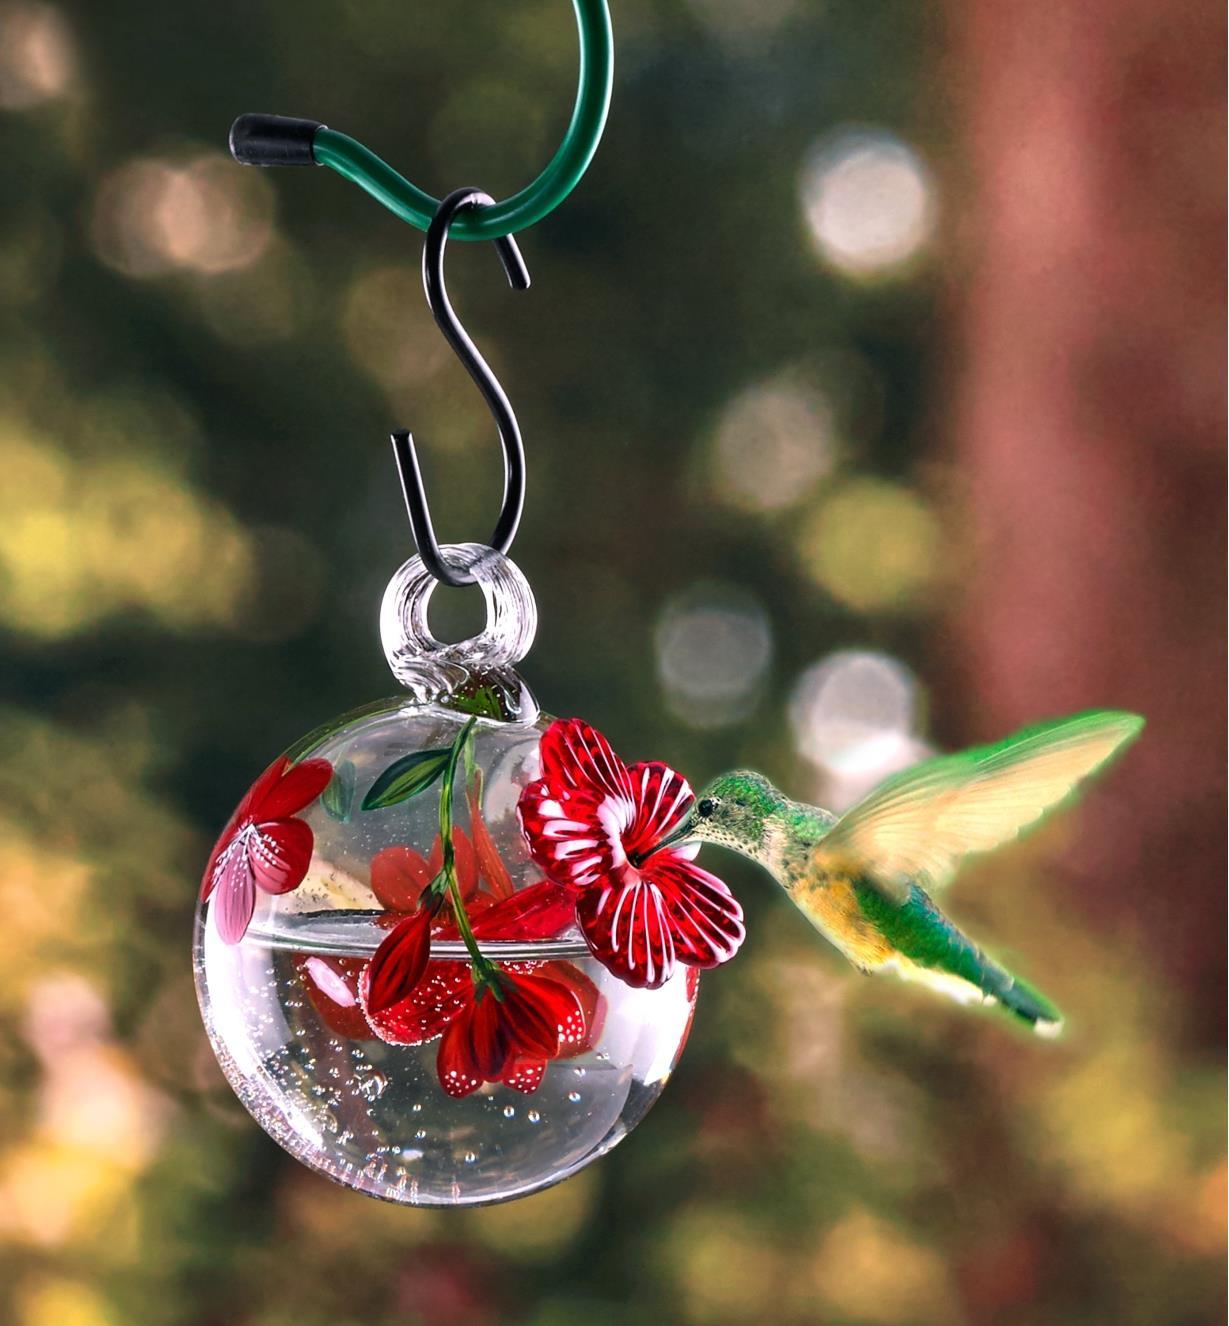 A hummingbird eats from the feeder